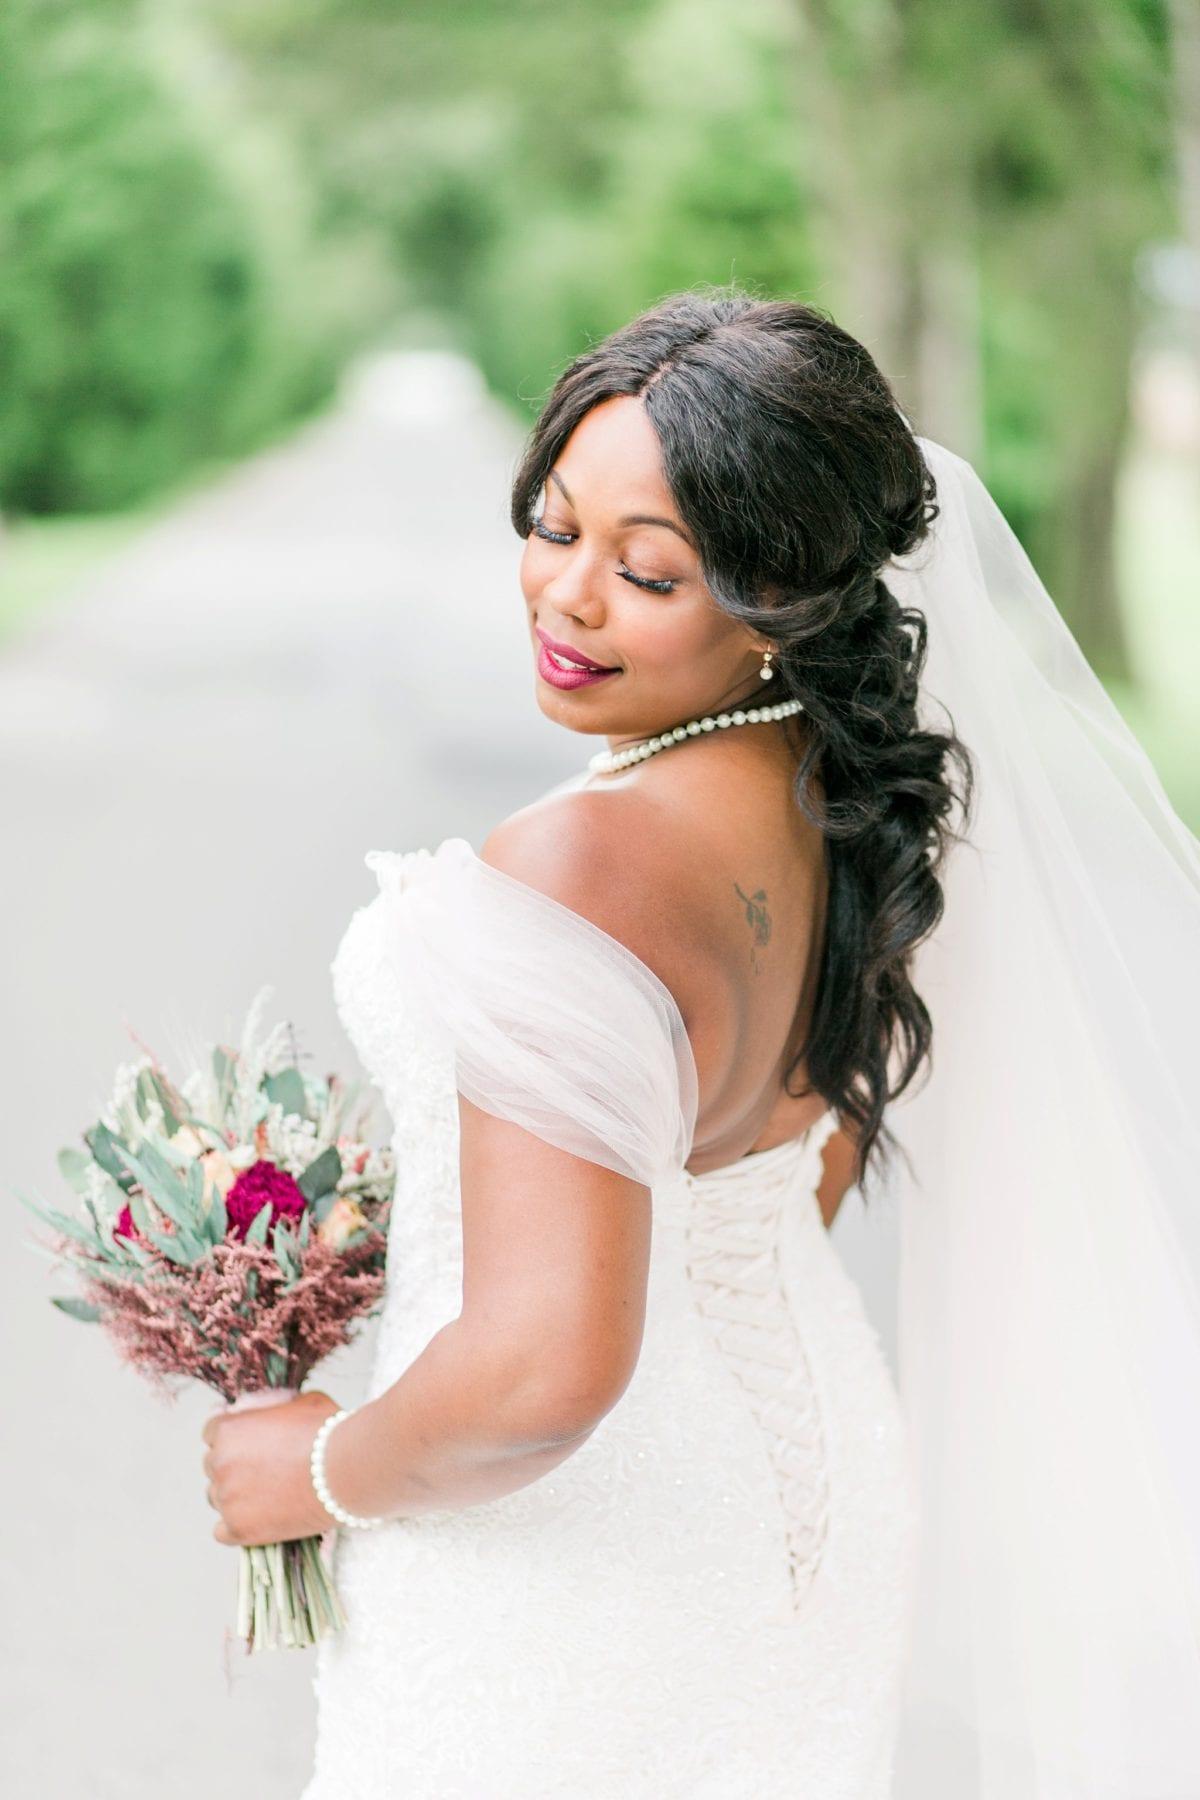 Jefferson Patterson Park Wedding Maryland Wedding Photographer Megan Kelsey Photography Jasmine & Seyi-65.jpg